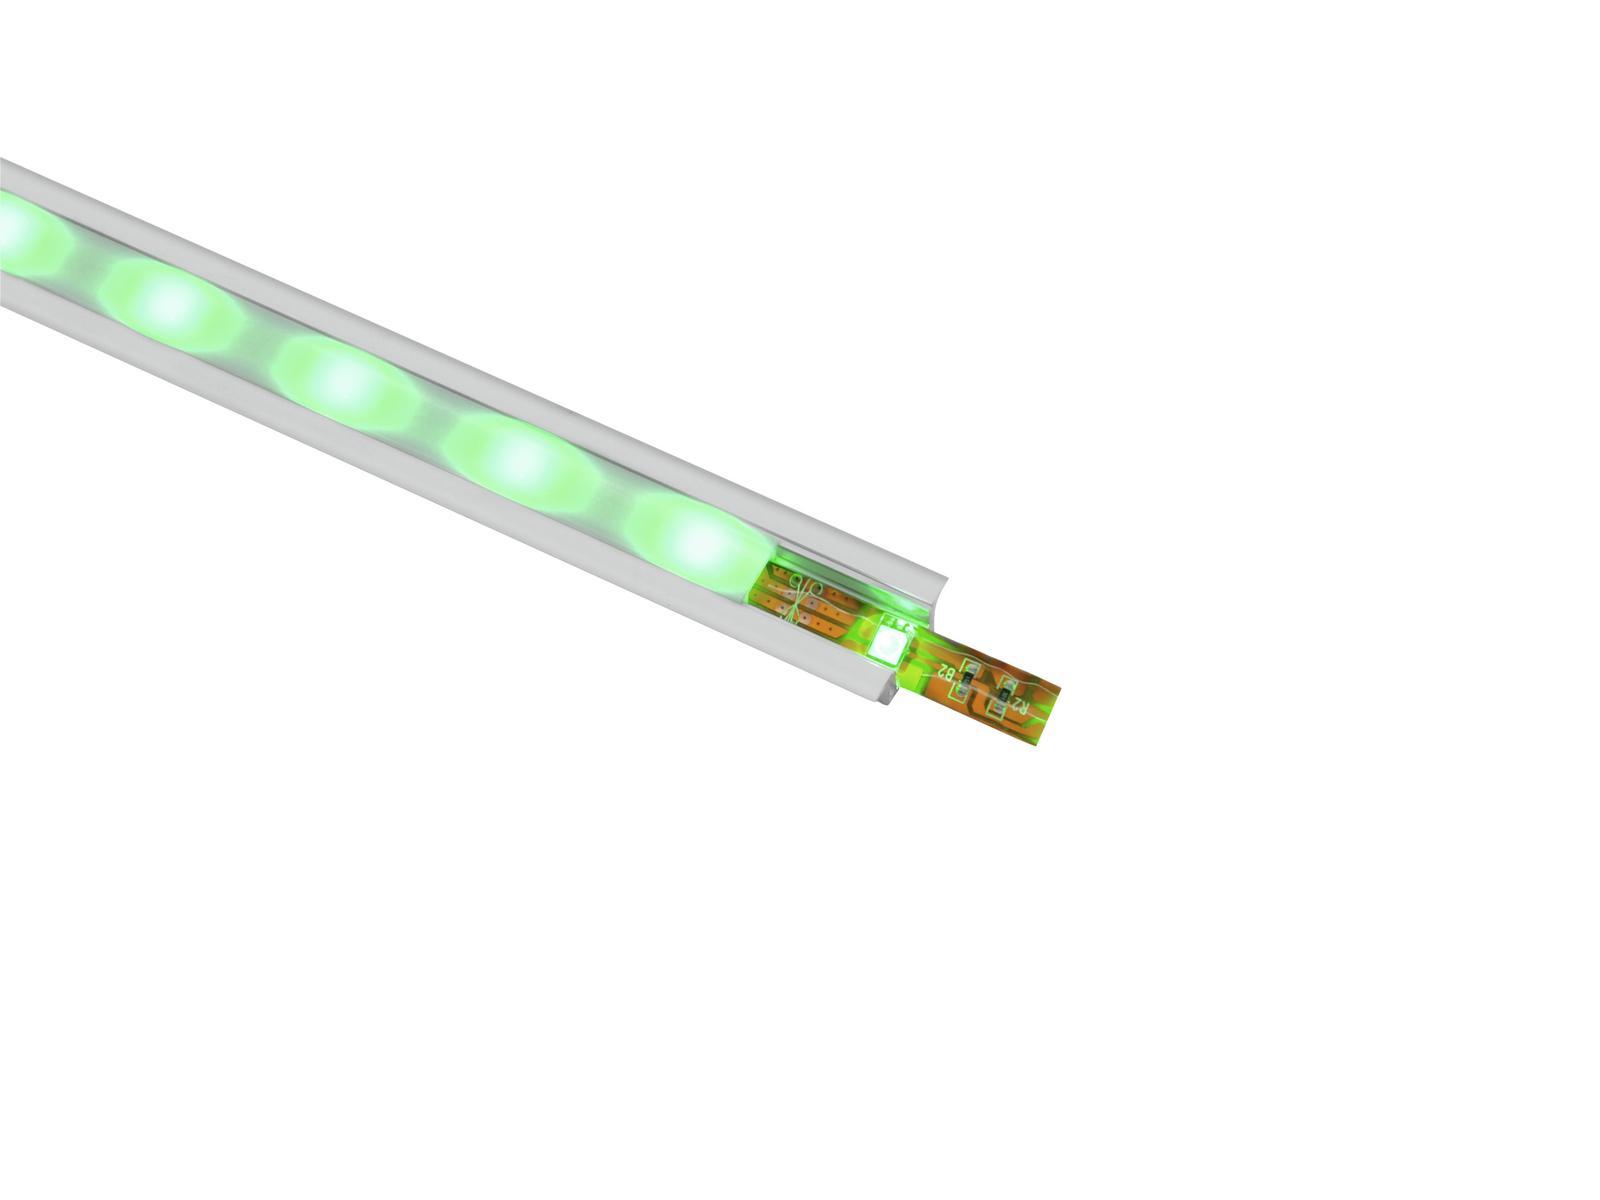 EUROLITE LED IP Striscia di 45 1,5 m RGB 12V estensione